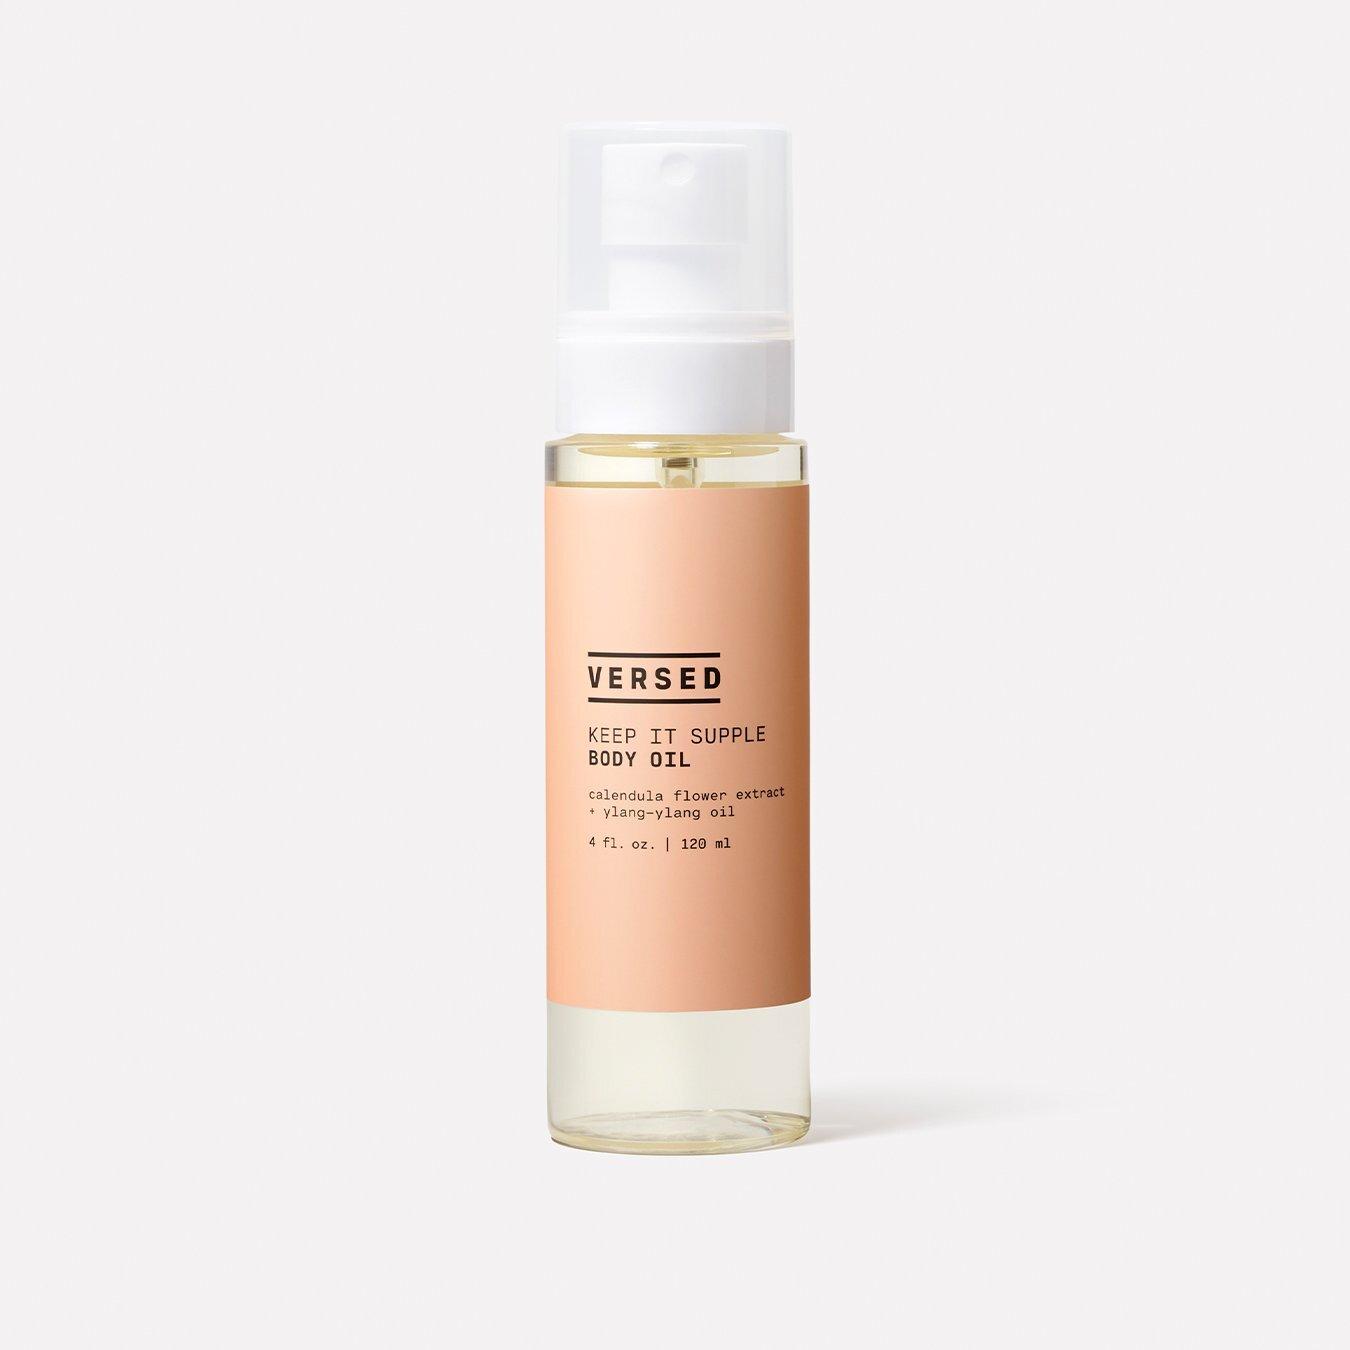 Versed-Skincare-Keep-it-supple-body-Oil-01_1800x.jpg